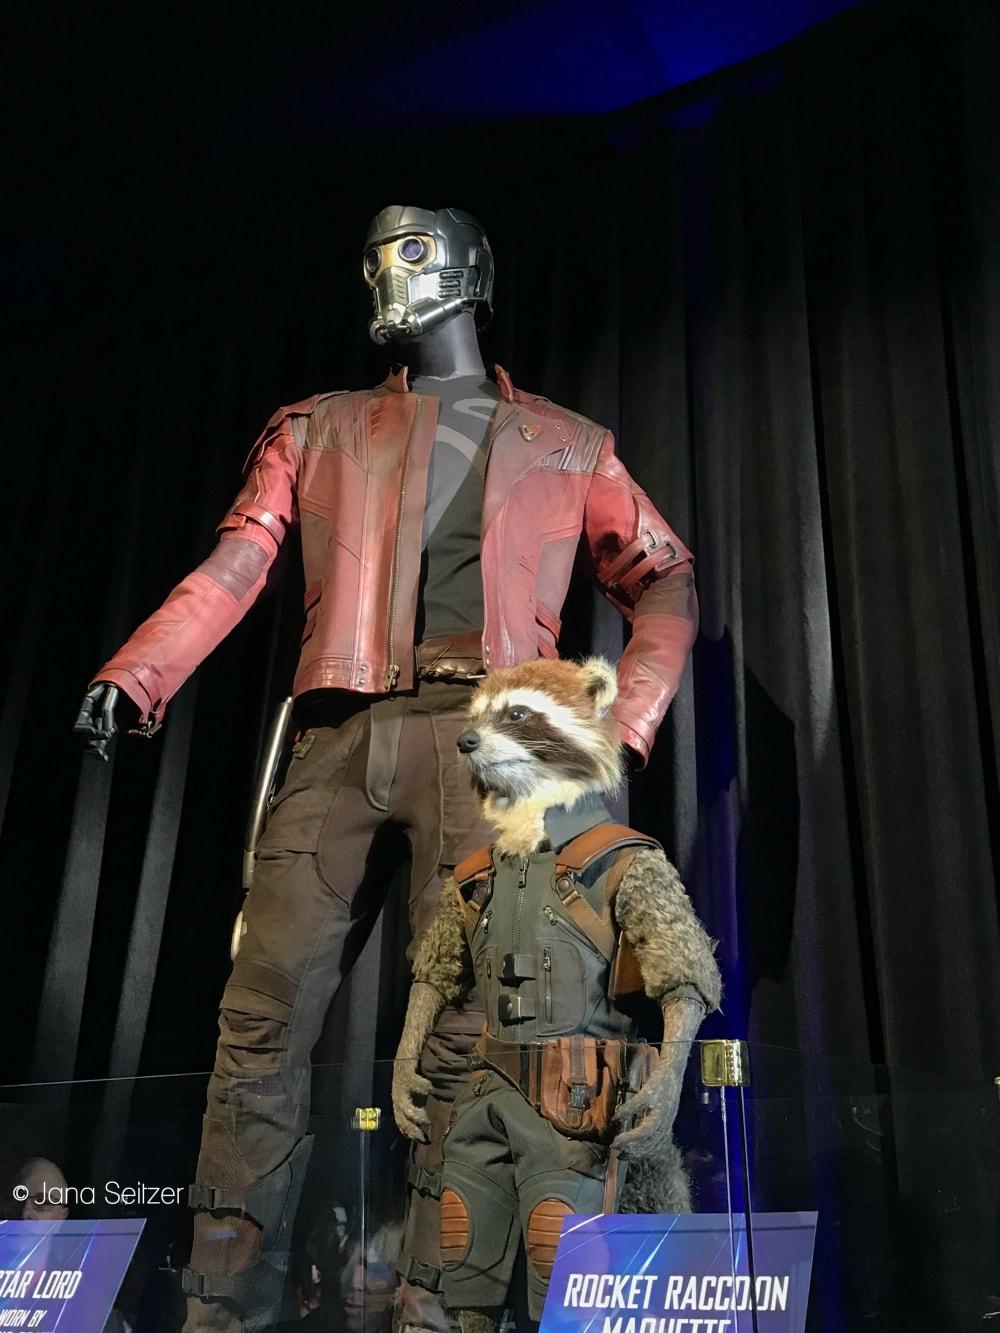 Avengers Infinity War Star Lord Rocket Raccoon Costumes